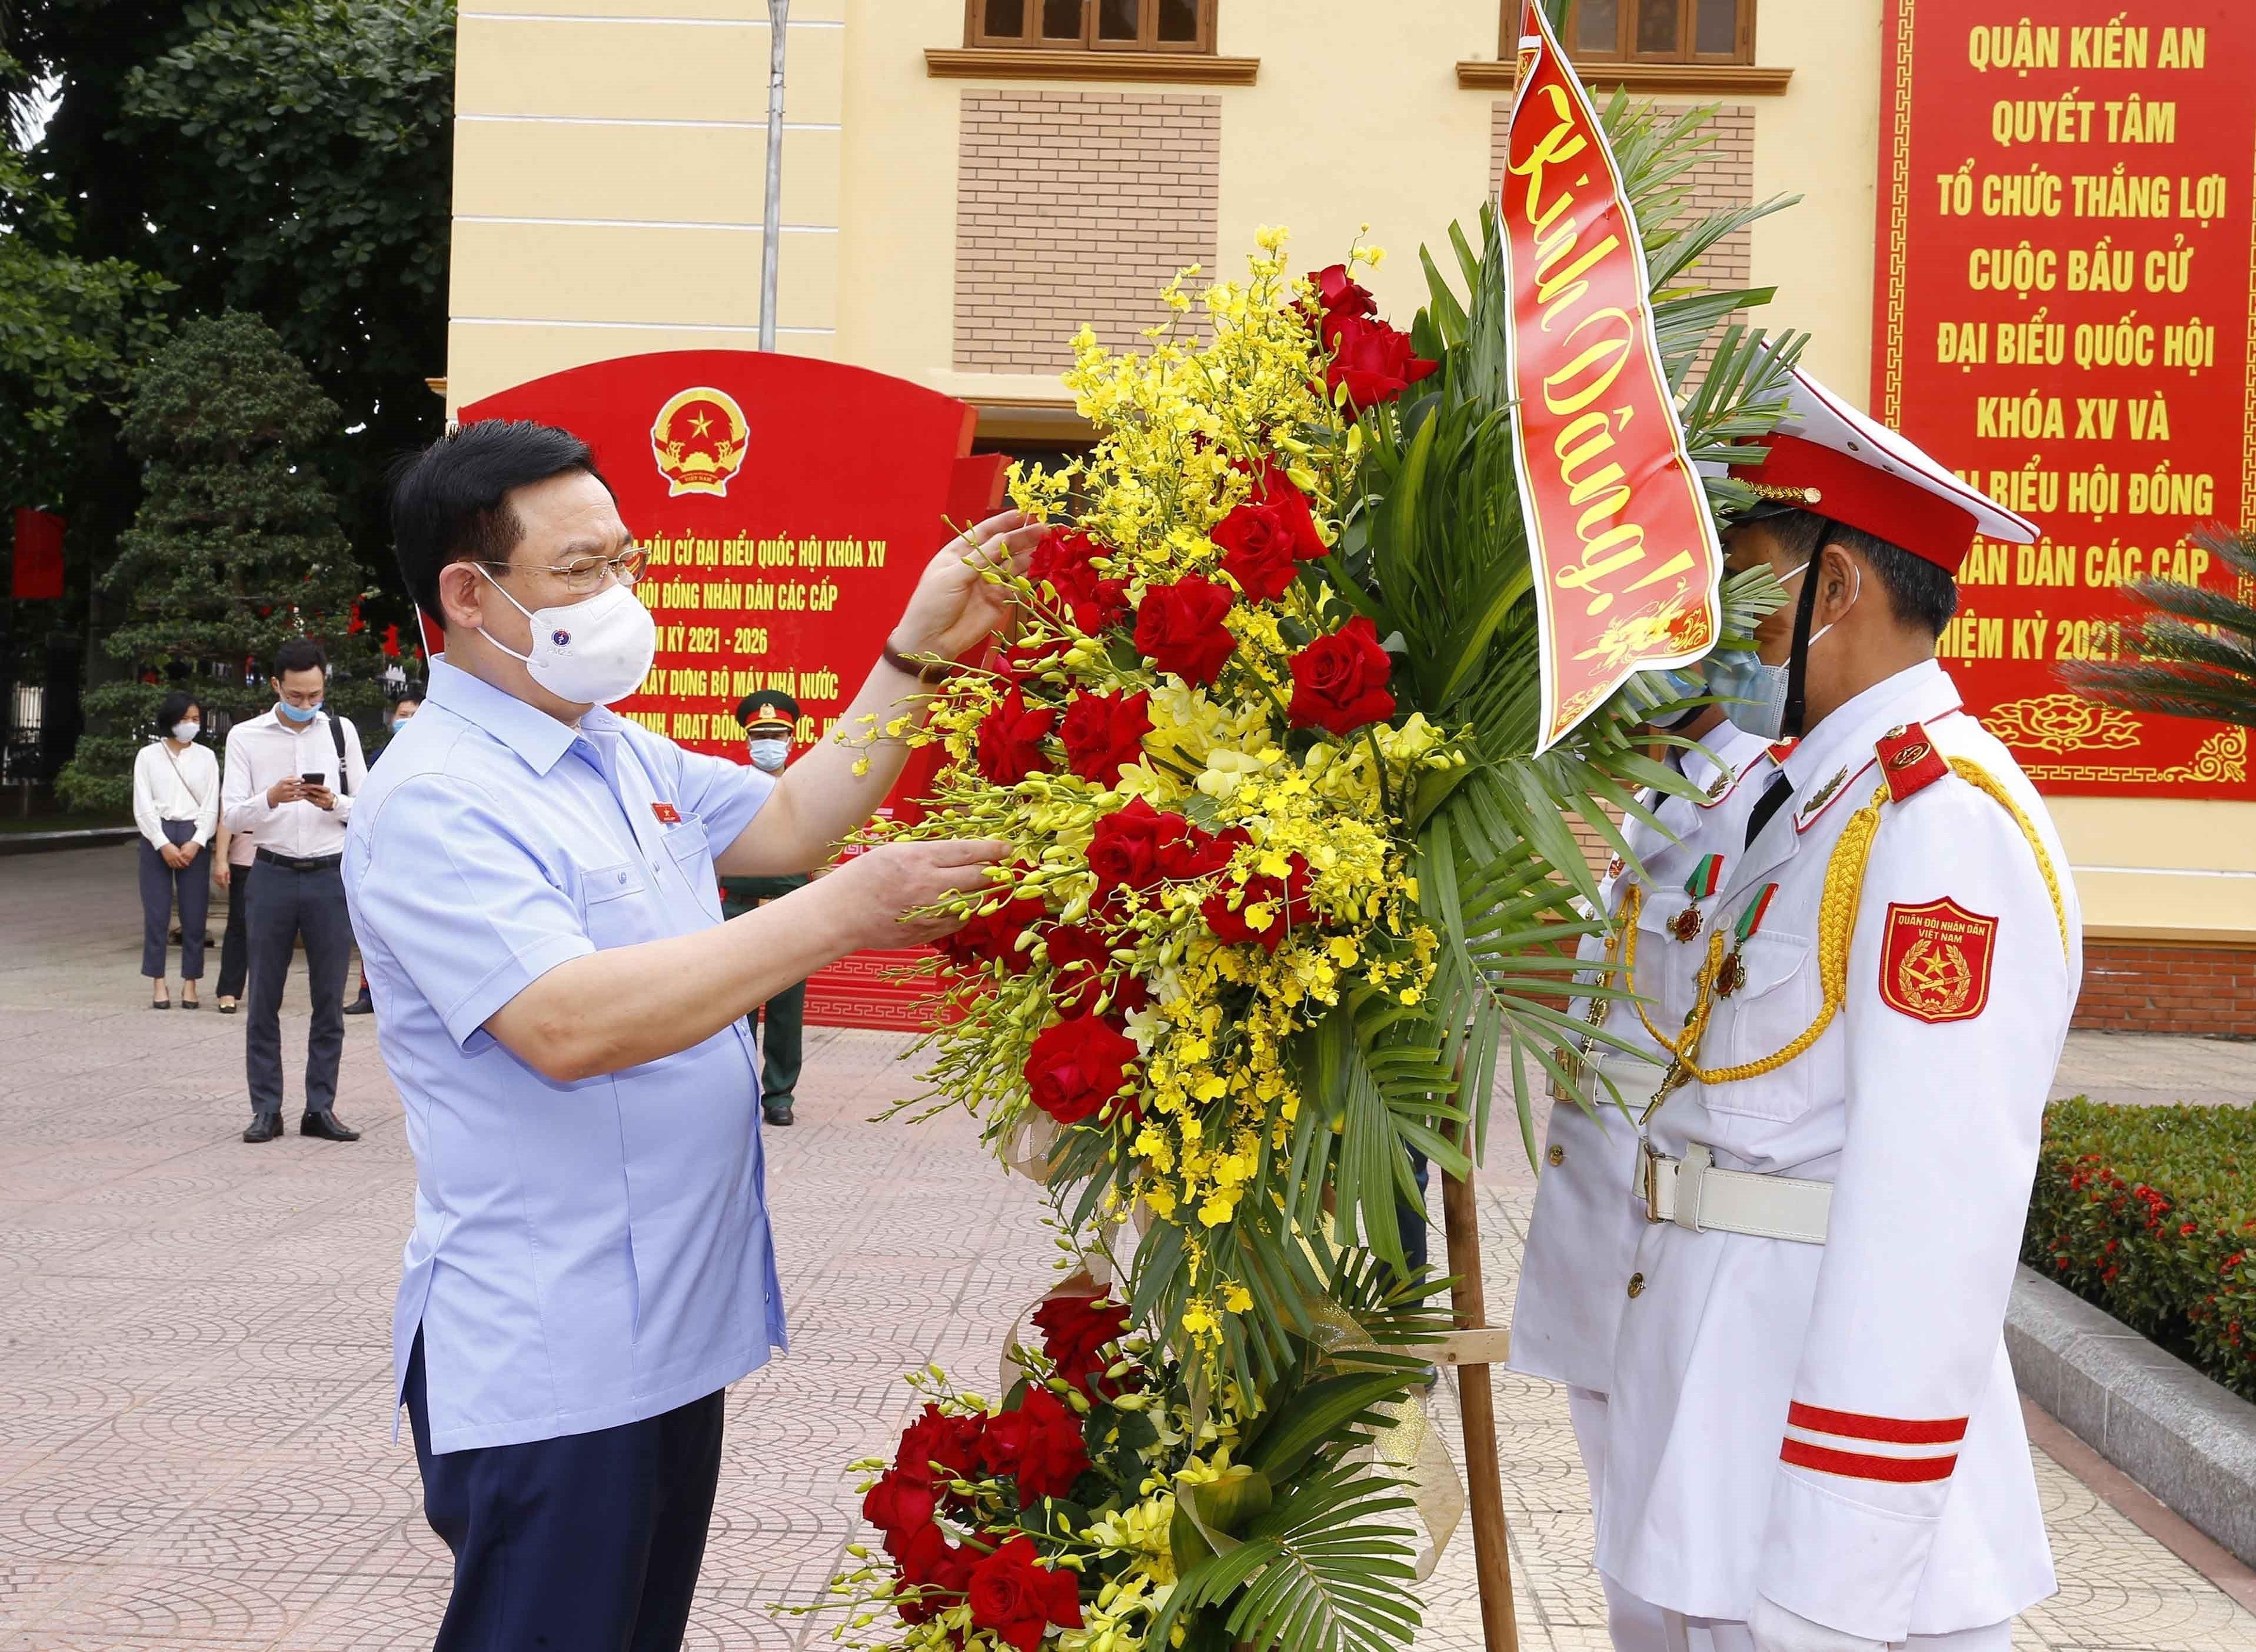 [Photo] Chu tich Quoc hoi Vuong Dinh Hue van dong bau cu tai Hai Phong hinh anh 9